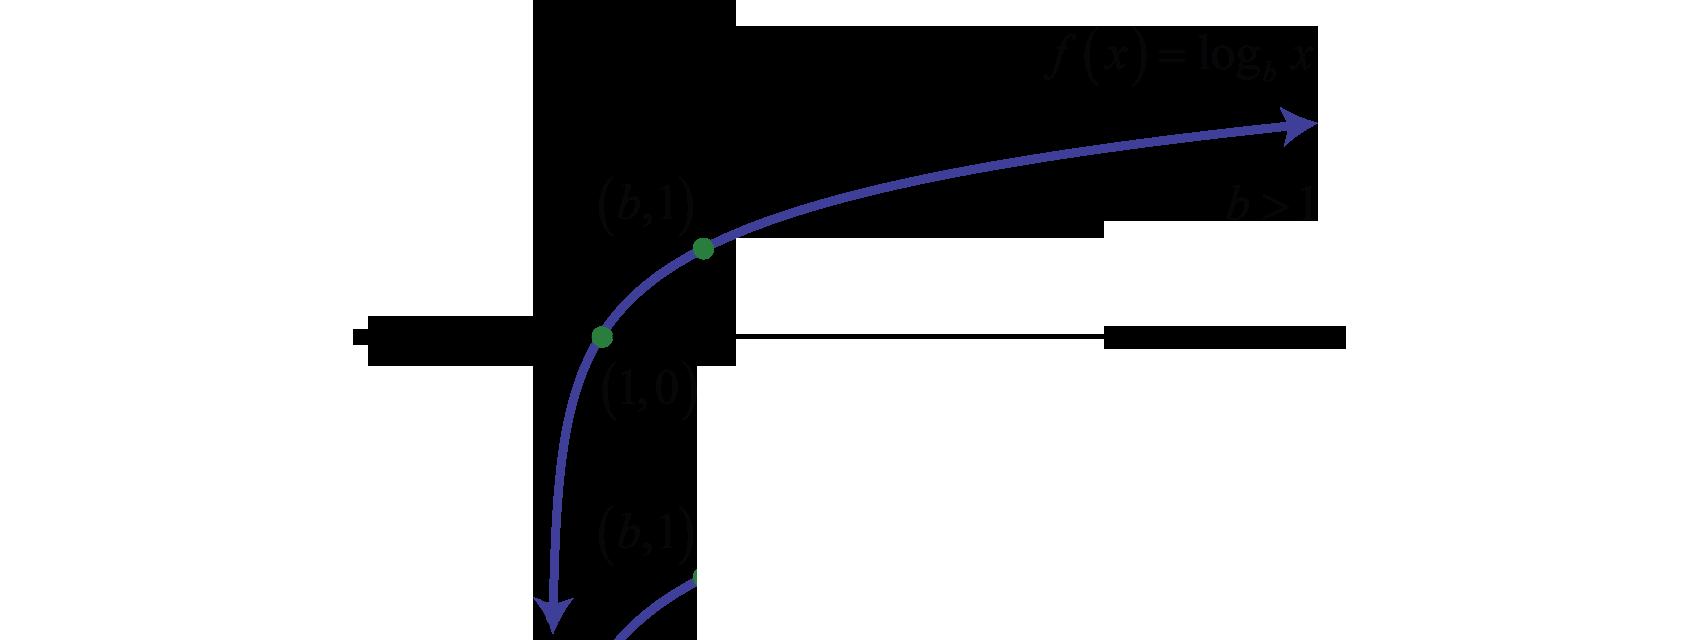 Intermediate Algebra 1.0 | FlatWorld Y Intercept Example